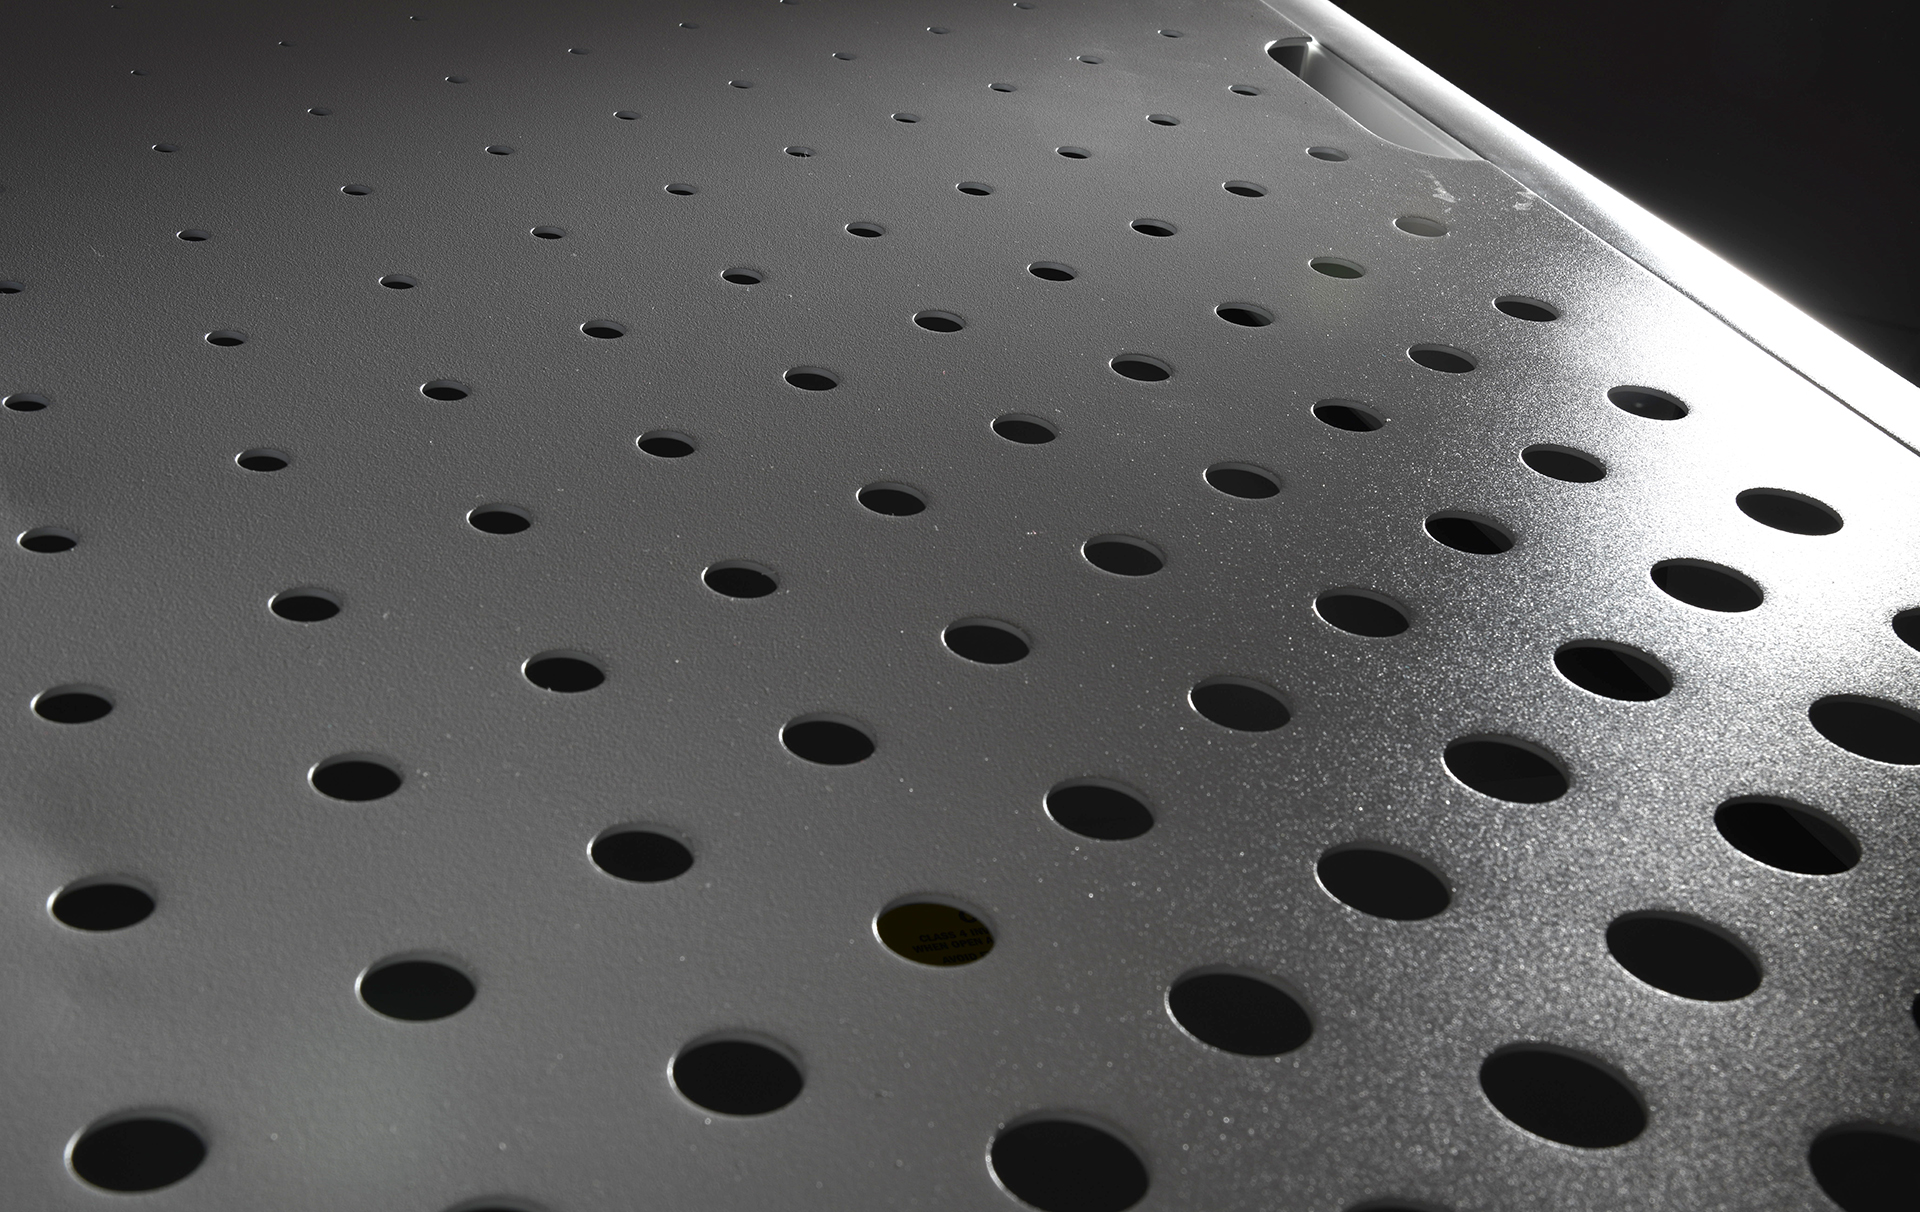 Biodesy-04-Detail.JPG